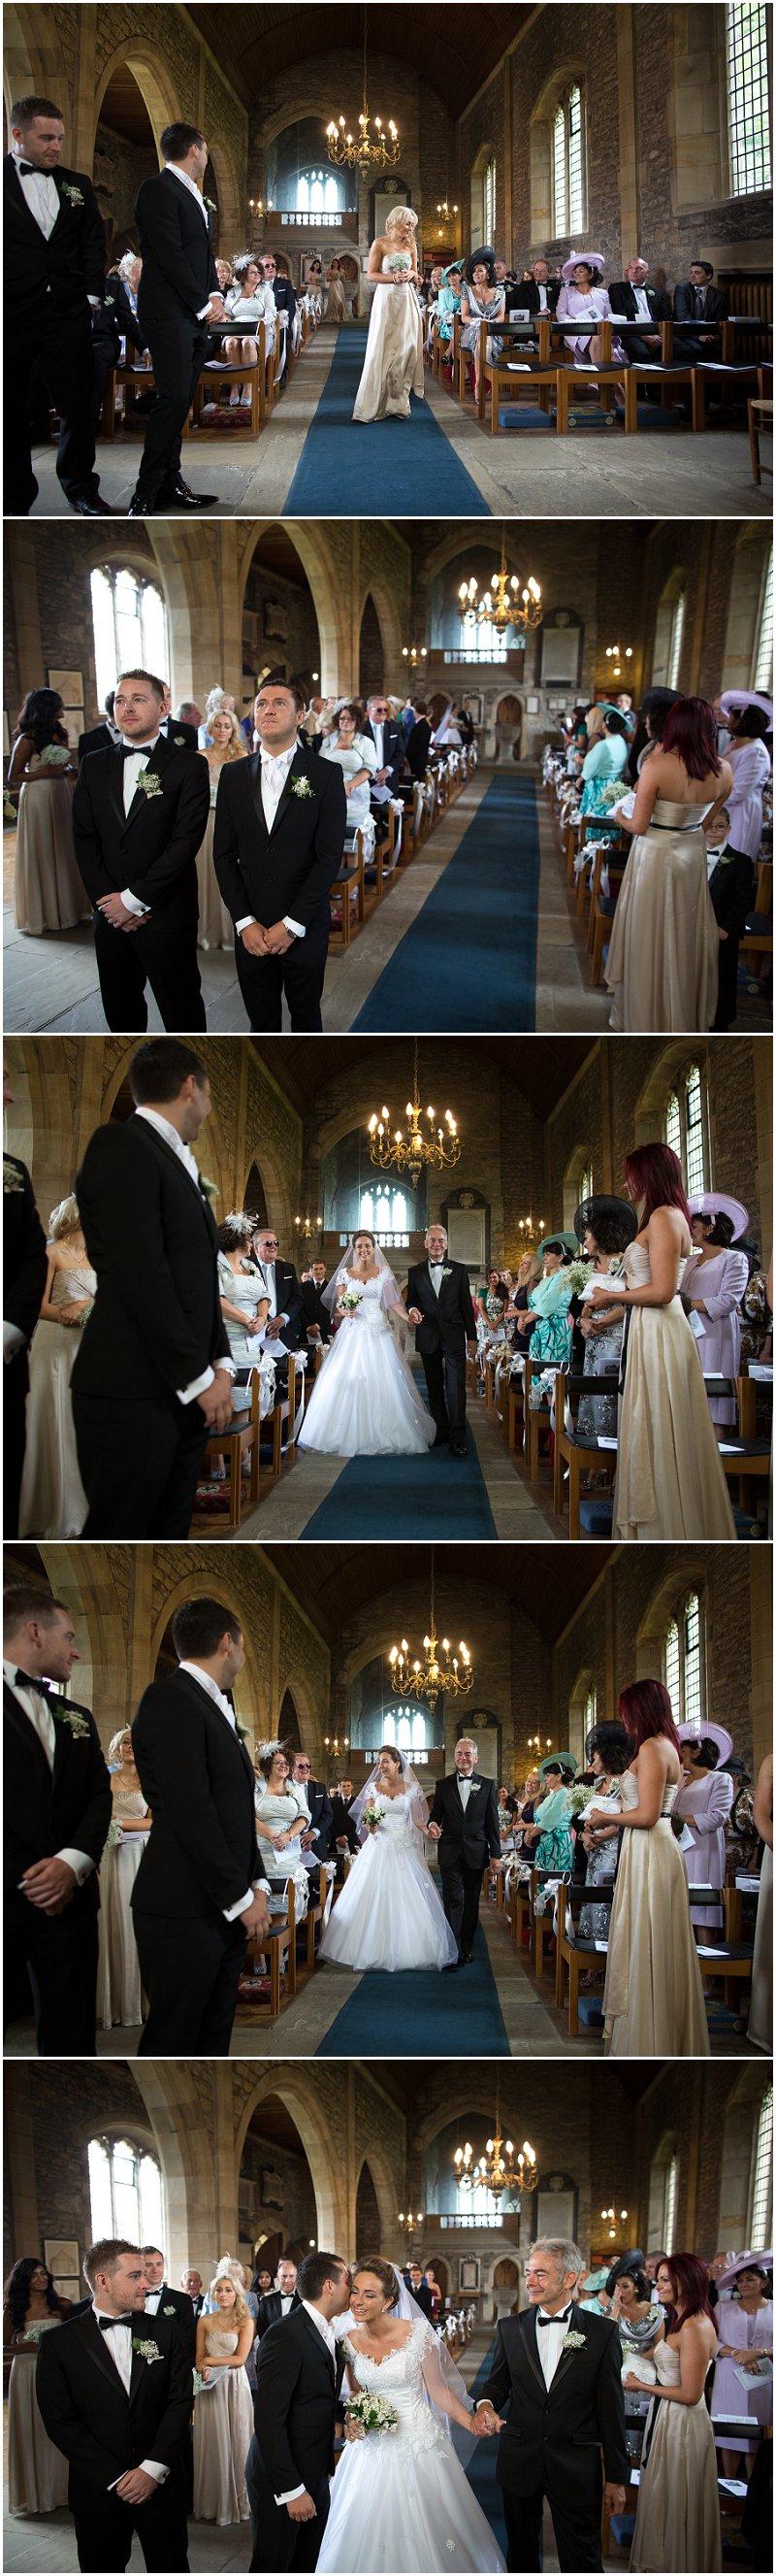 Bride walks down the aisle at Lancashire Wedding